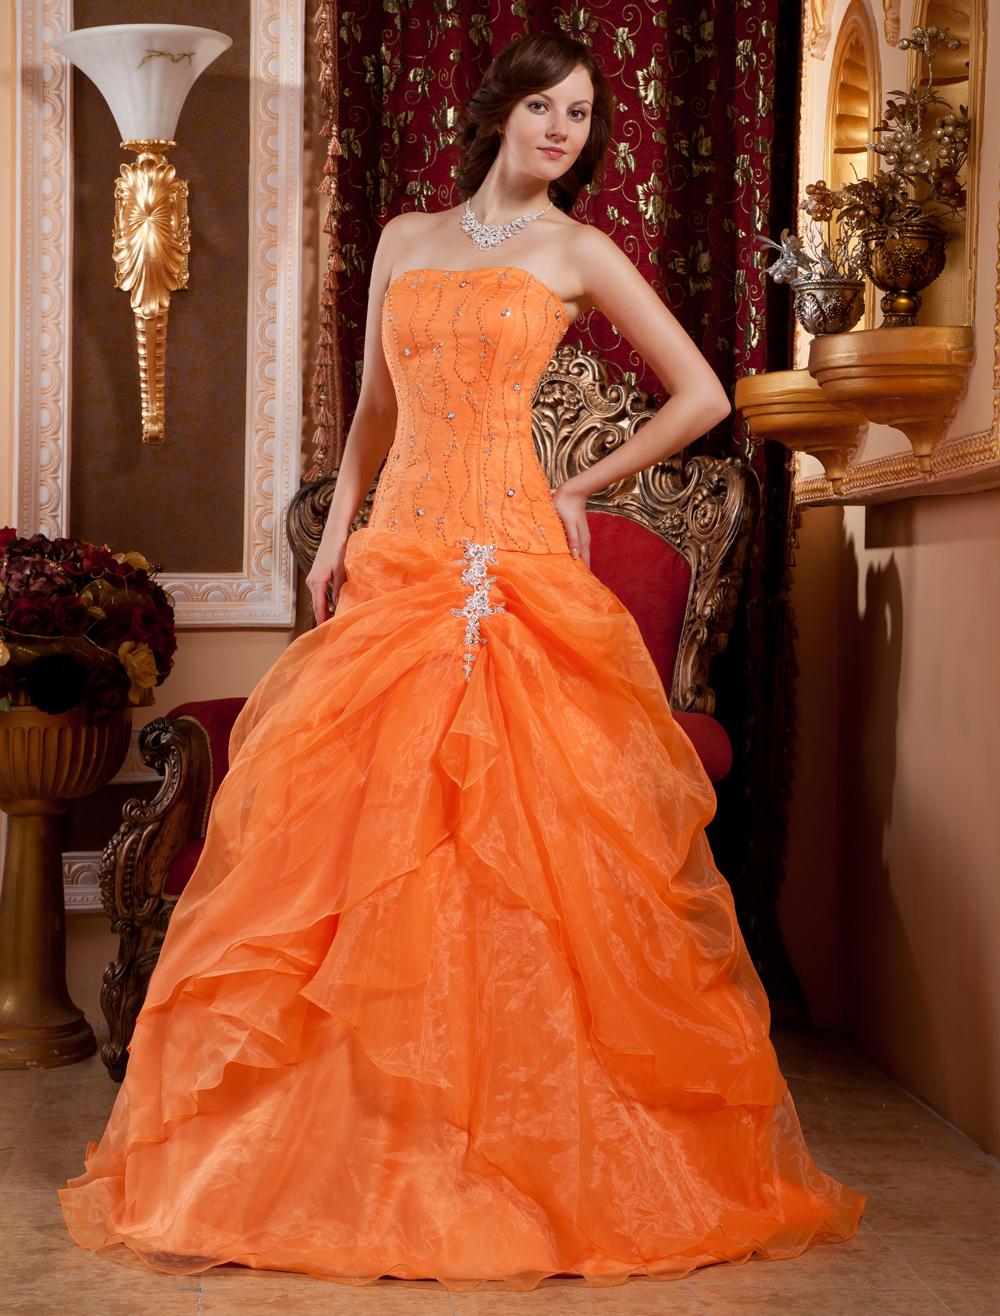 Ball Gown Orange Strapless Quinceanera Dress - Milanoo.com